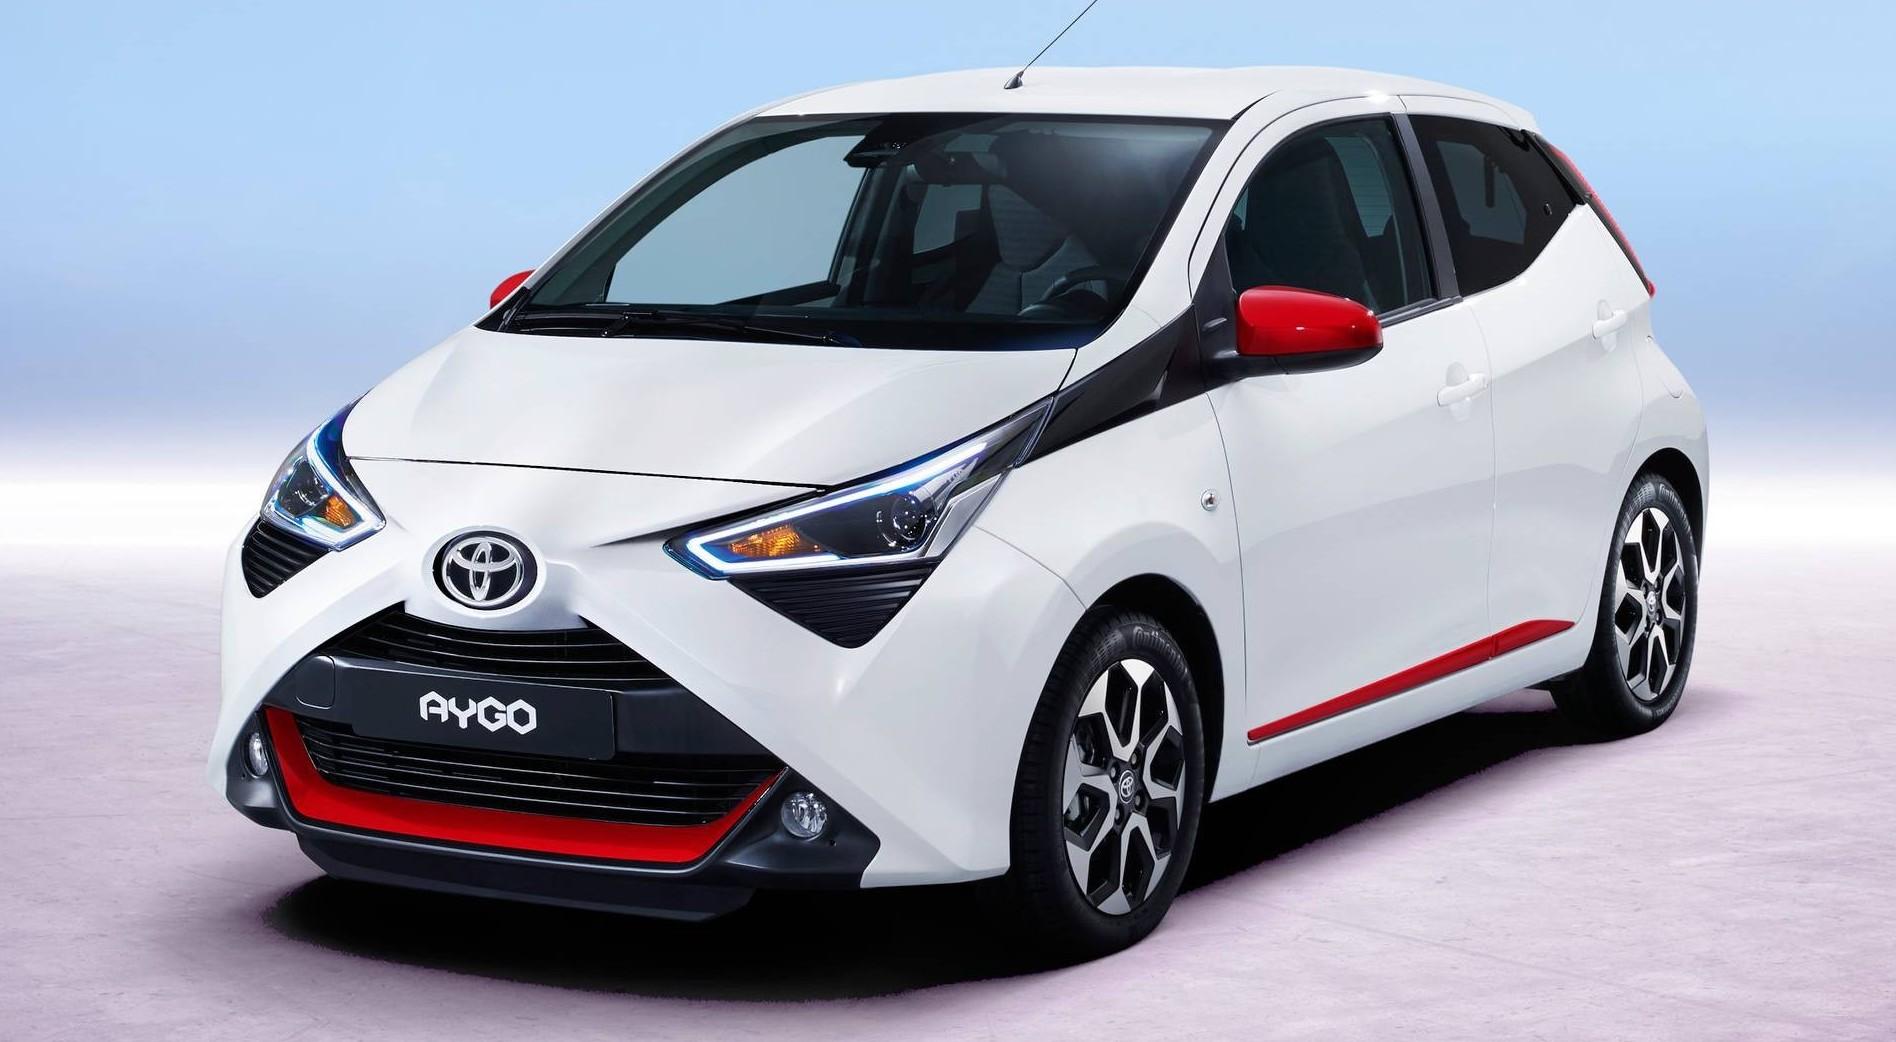 Toyota Aygo 2019 prezzi listino, modelli